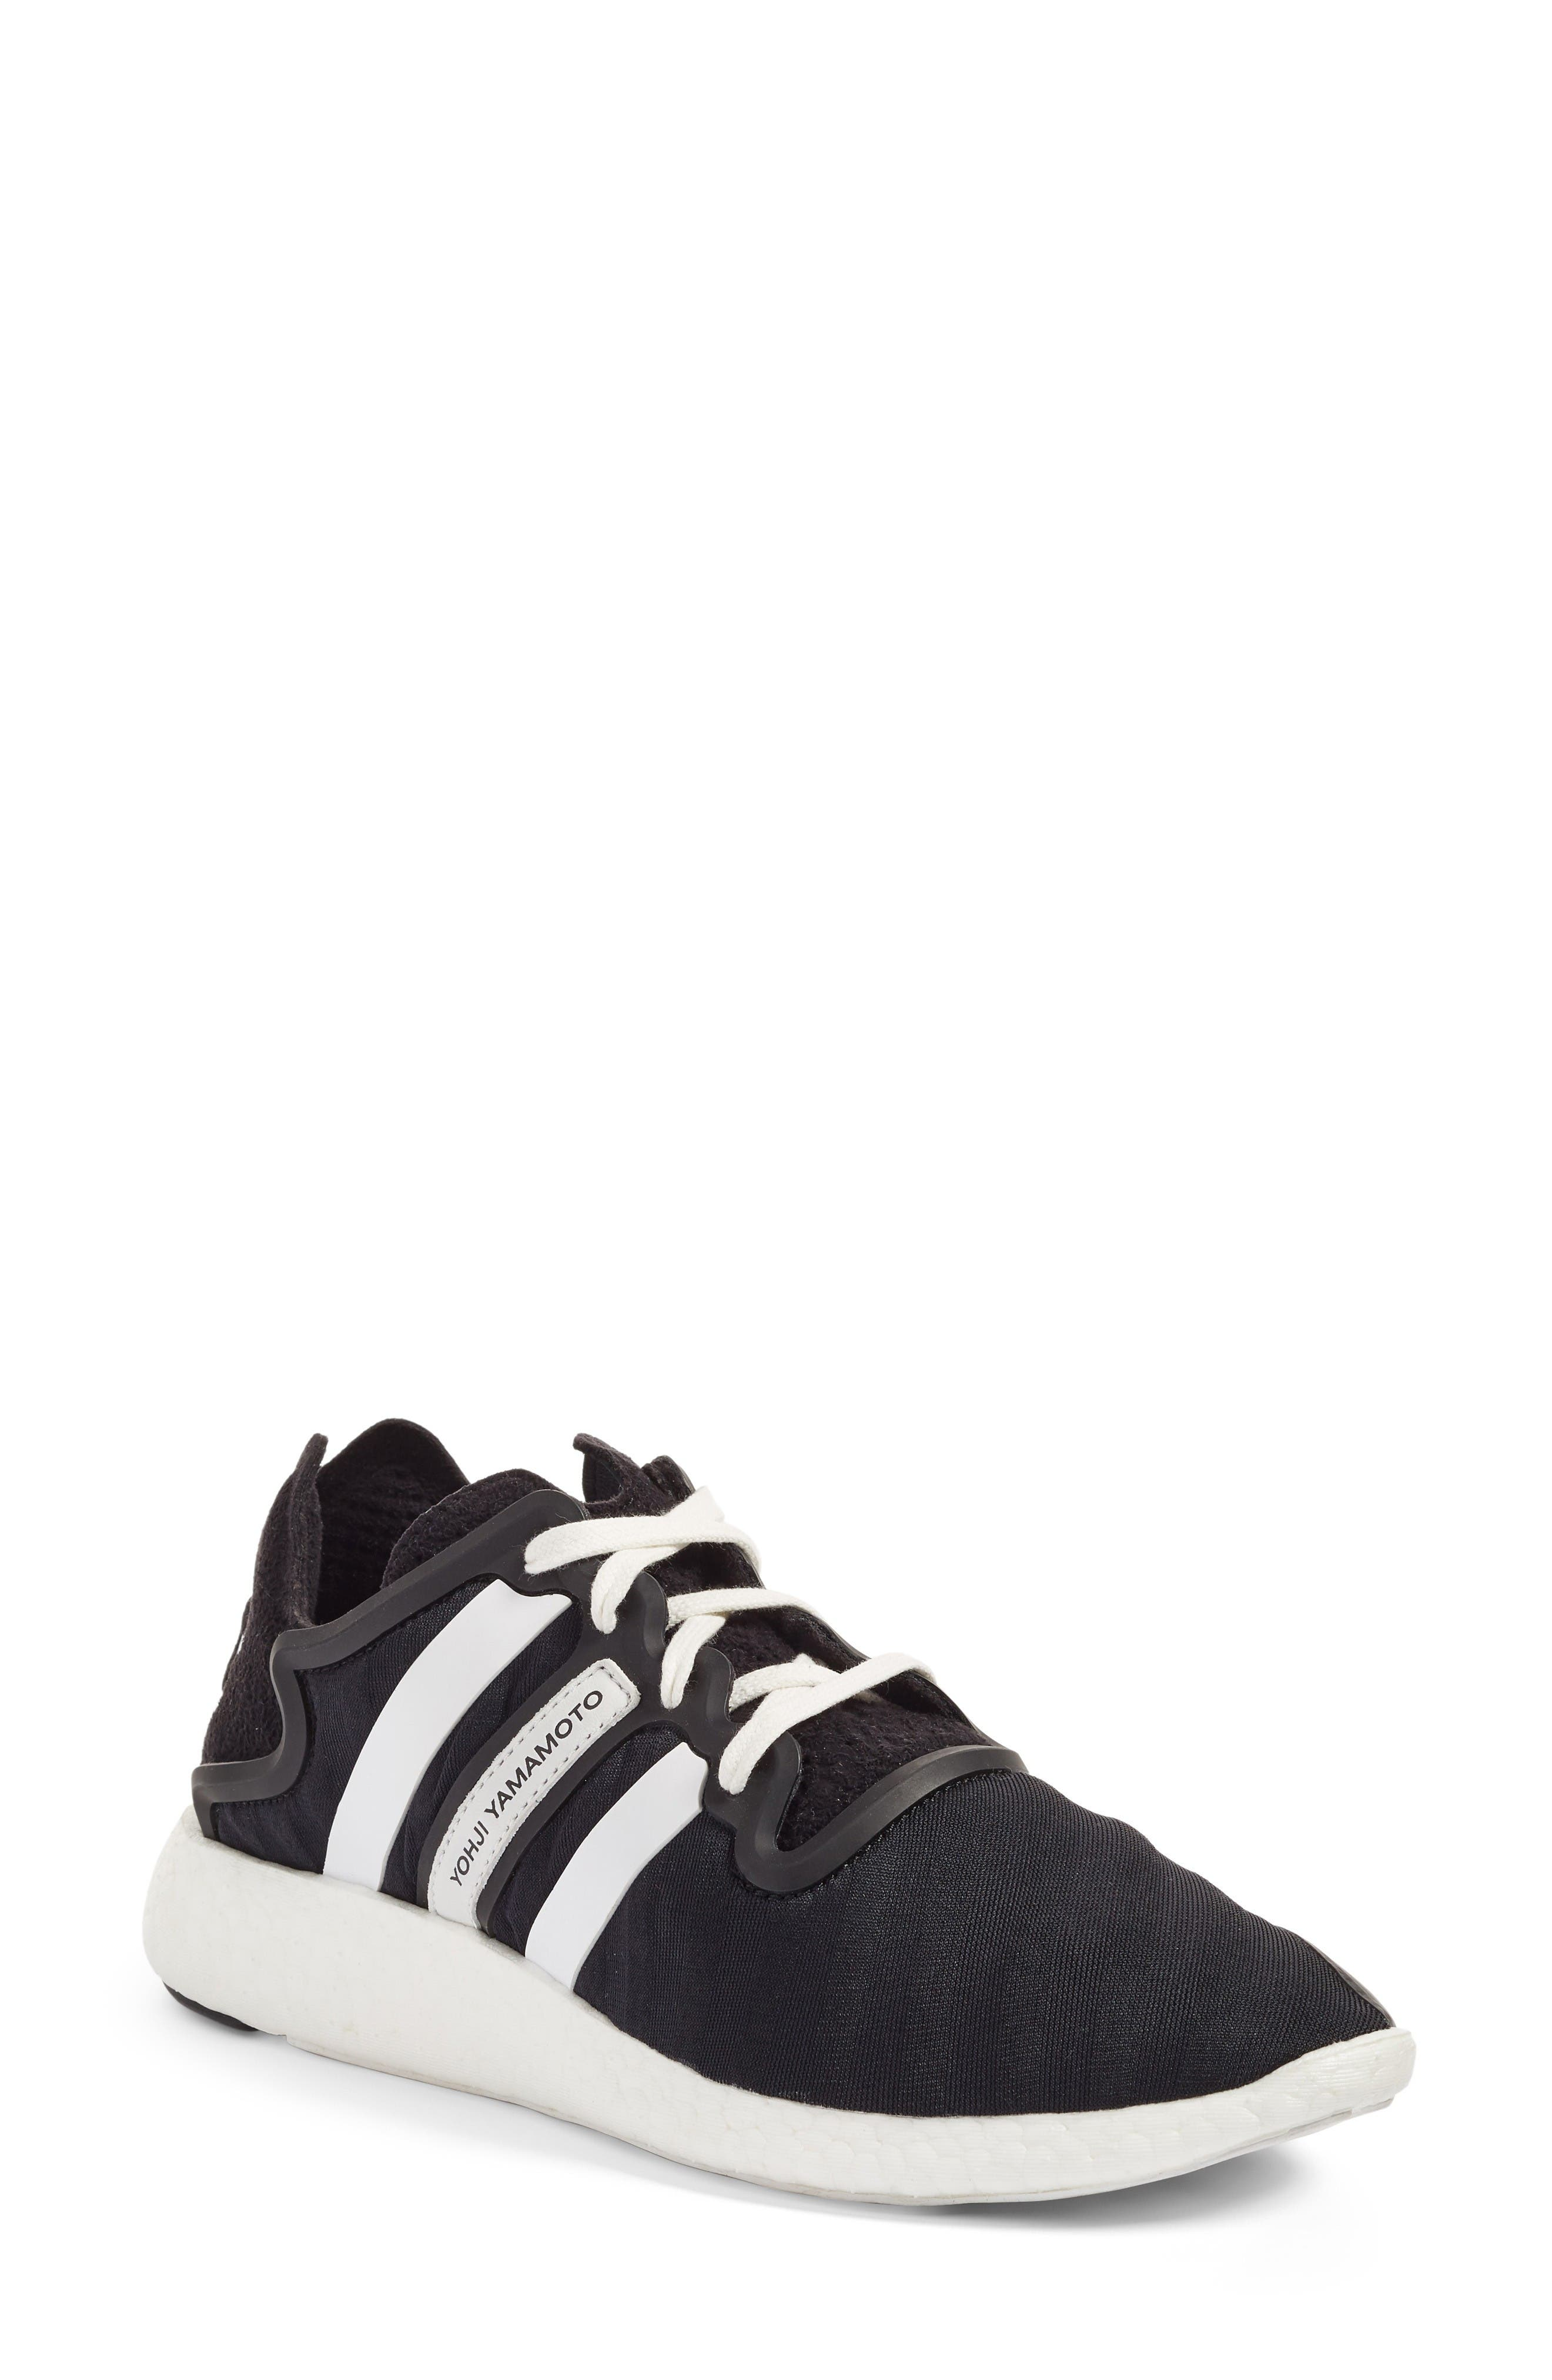 Alternate Image 1 Selected - Y-3 Yohji Run Sneaker (Women)